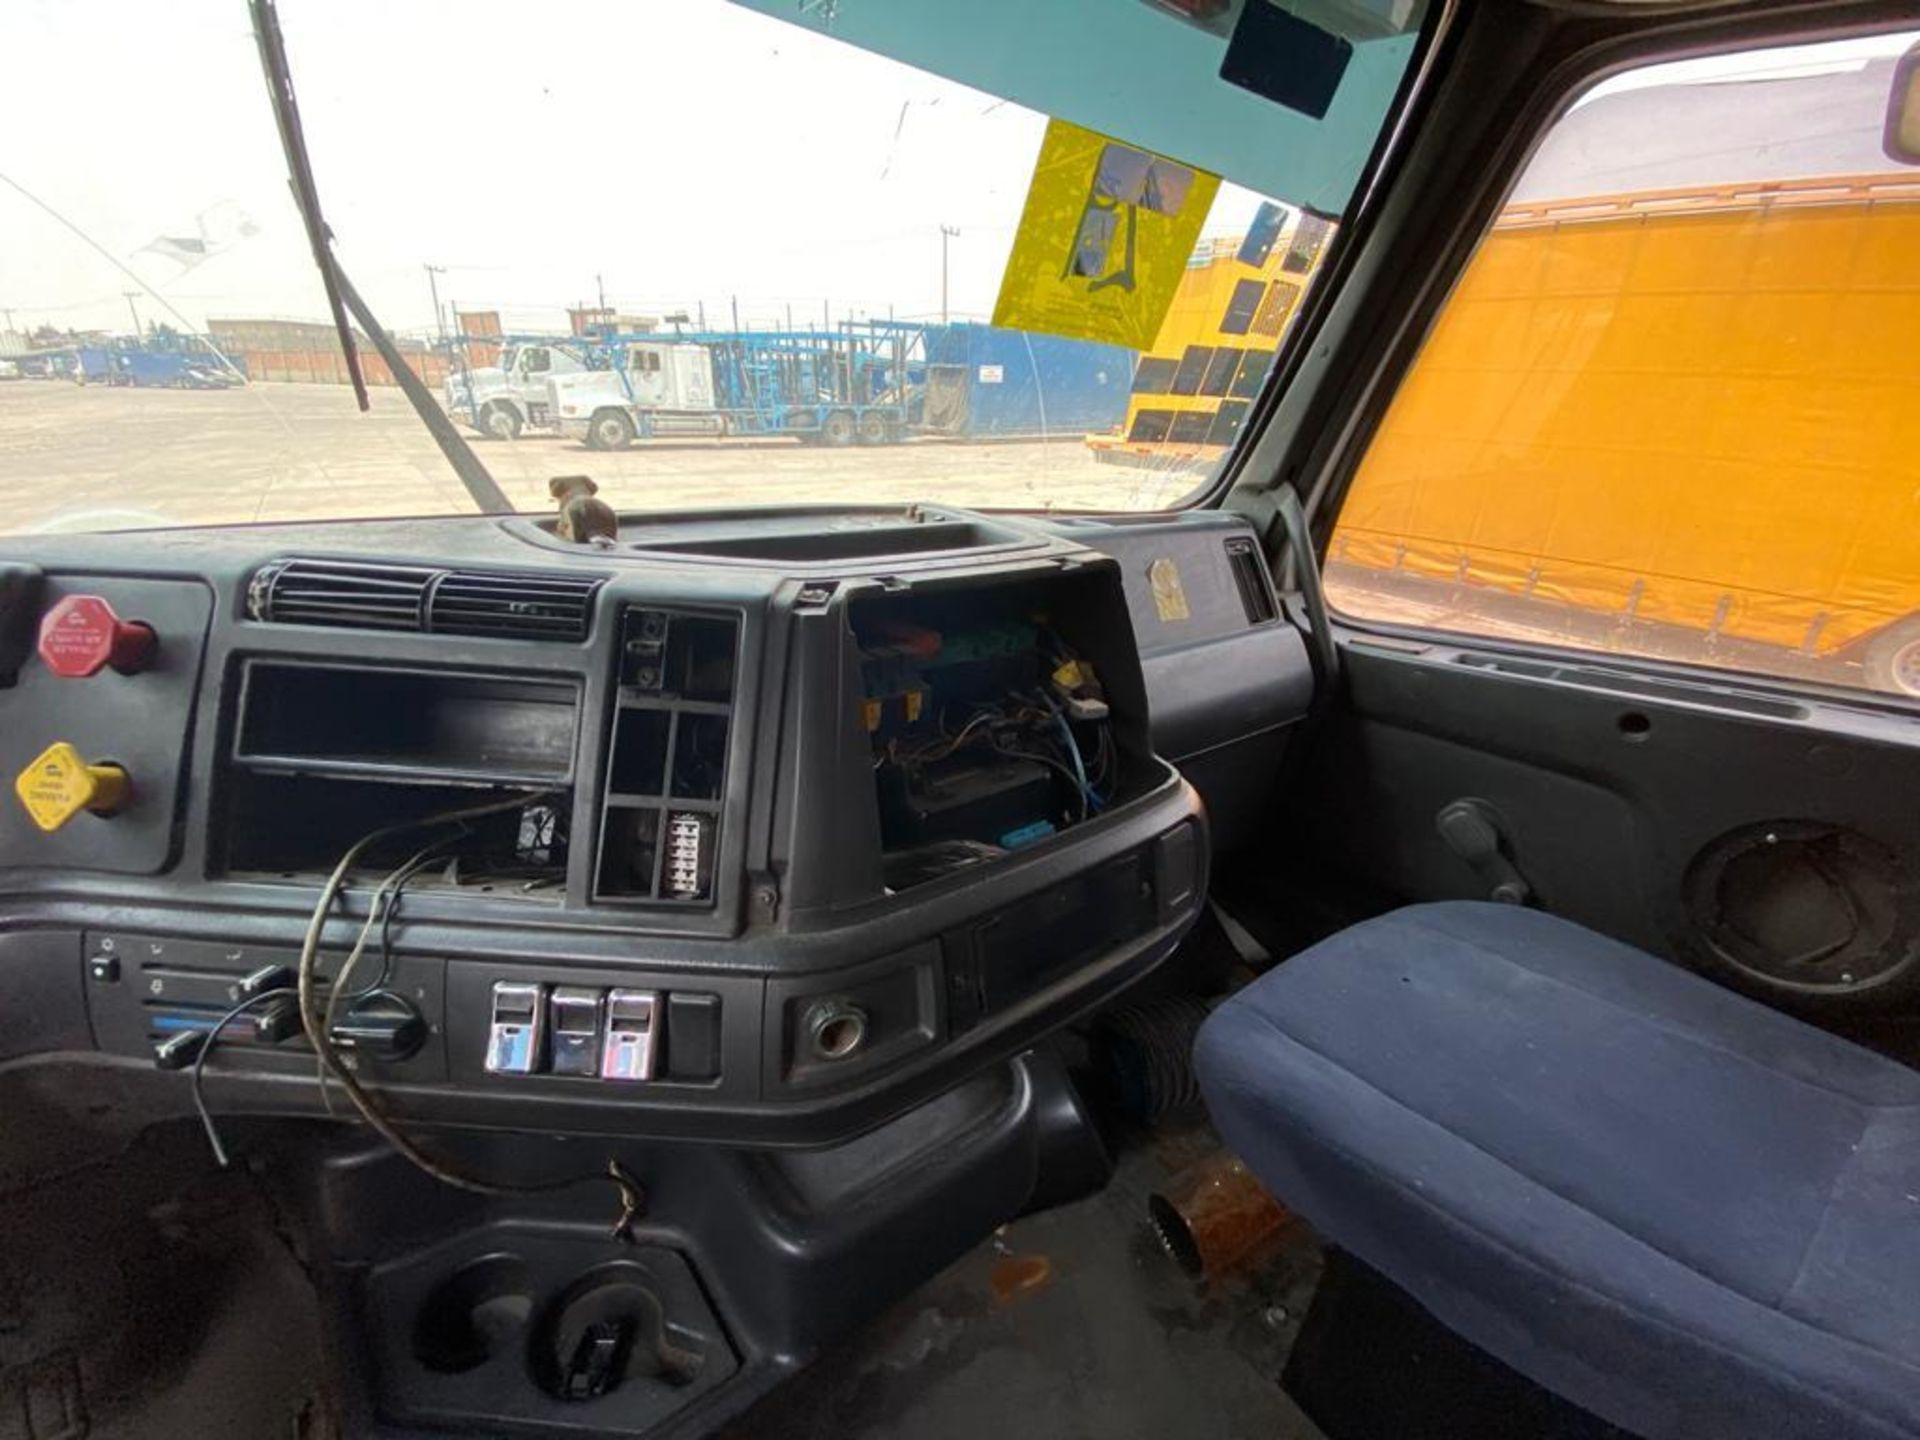 2001 Volvo Sleeper Truck Tractor, estándar transmissión of 18 speeds, with Volvo motor - Image 47 of 60